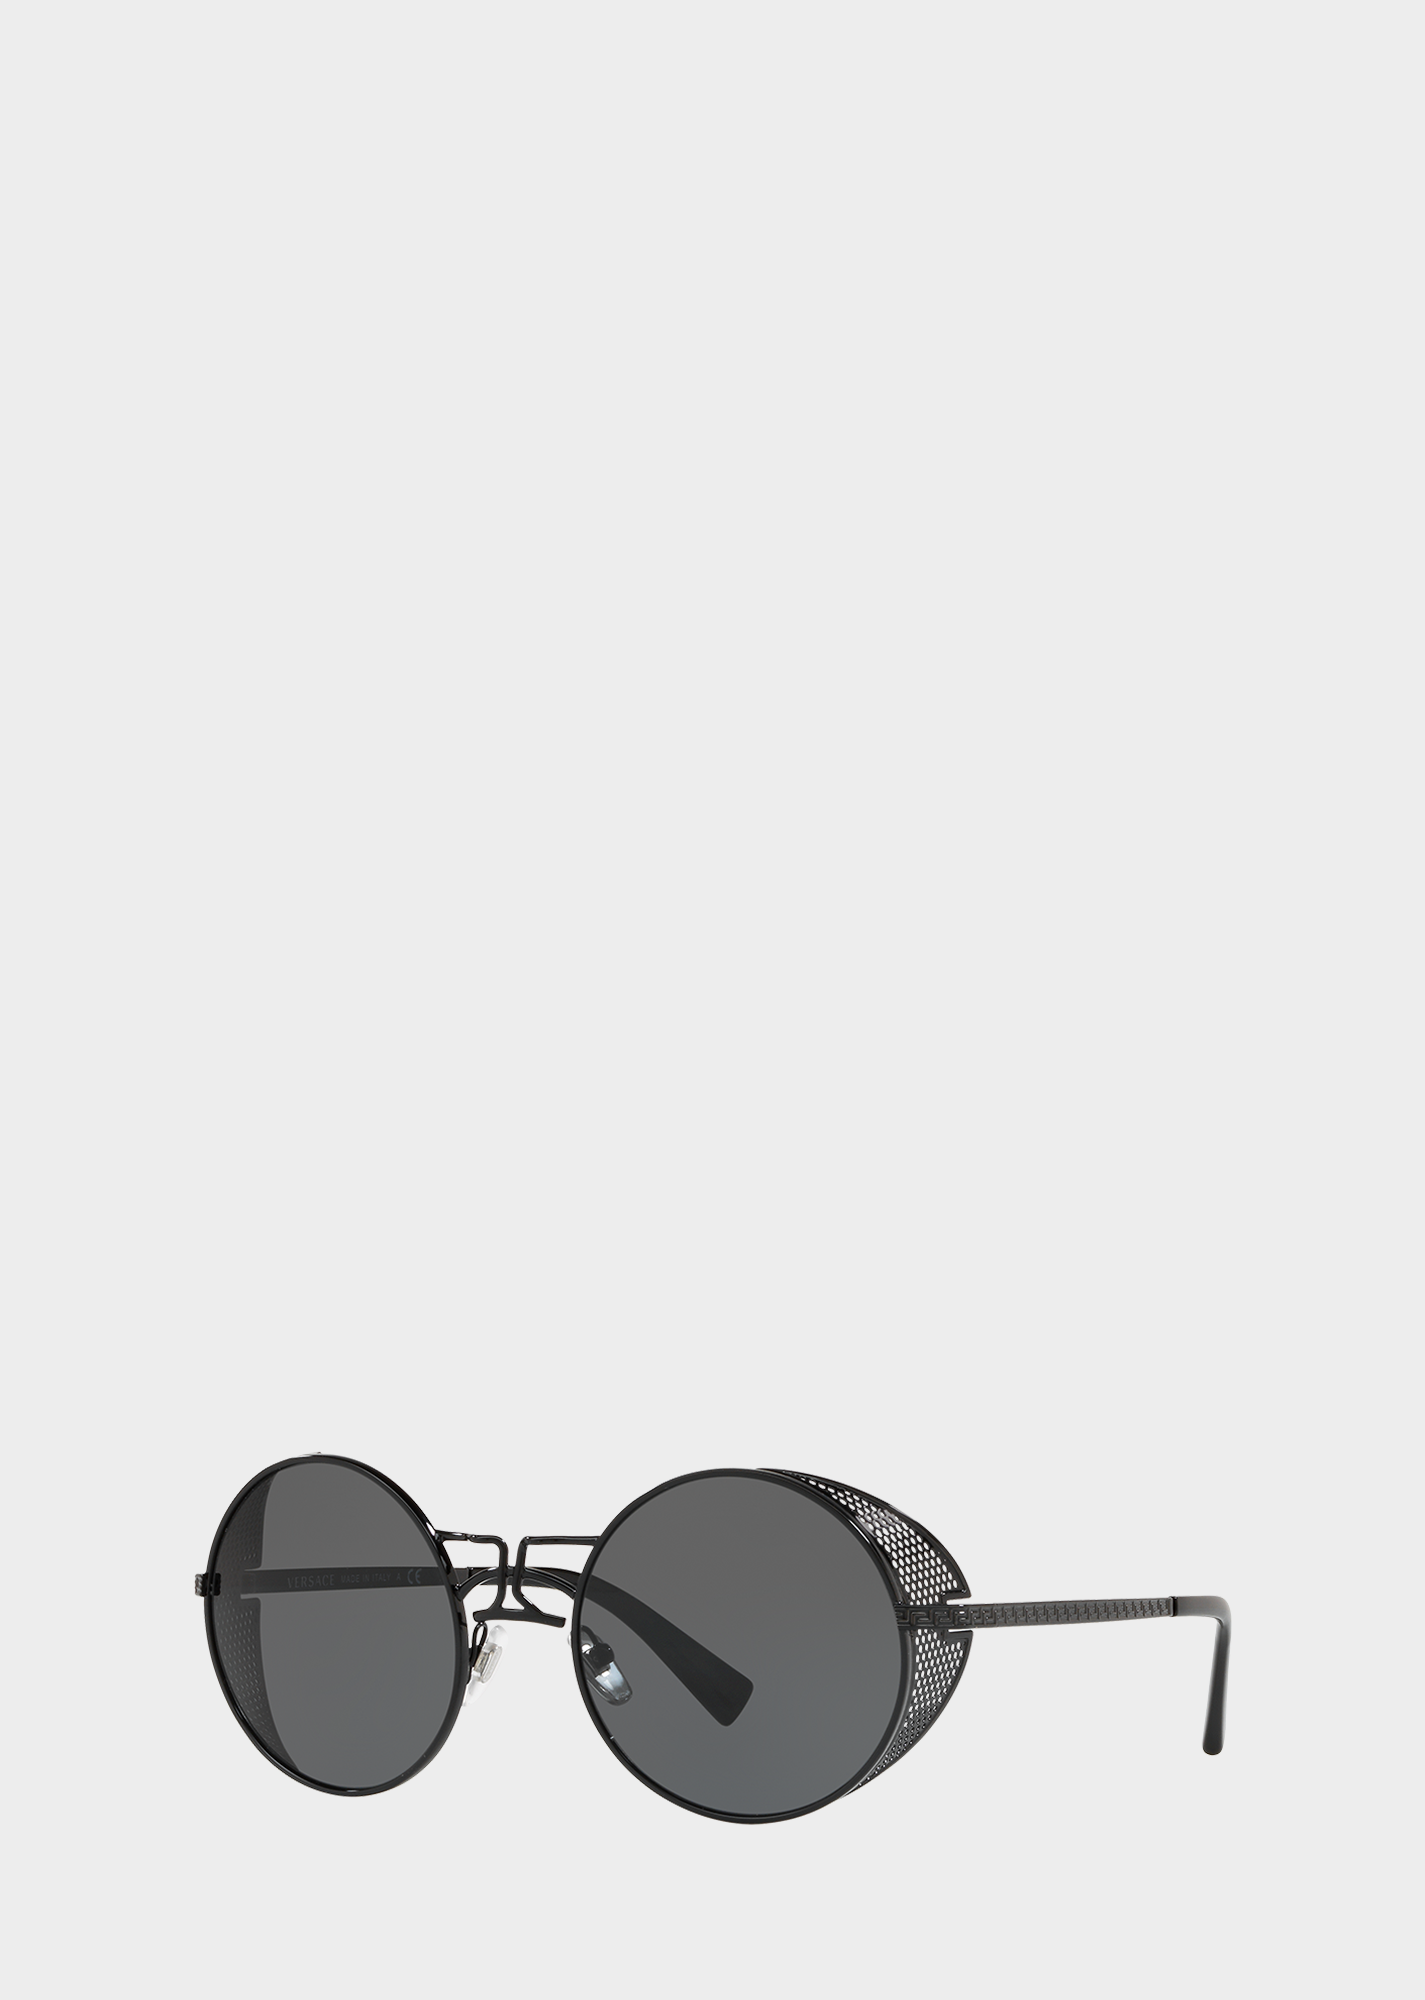 Versace Black Round Tribe Sunglasses For Men Us Online Store Sunglasses Rimless Sunglasses Versace Men